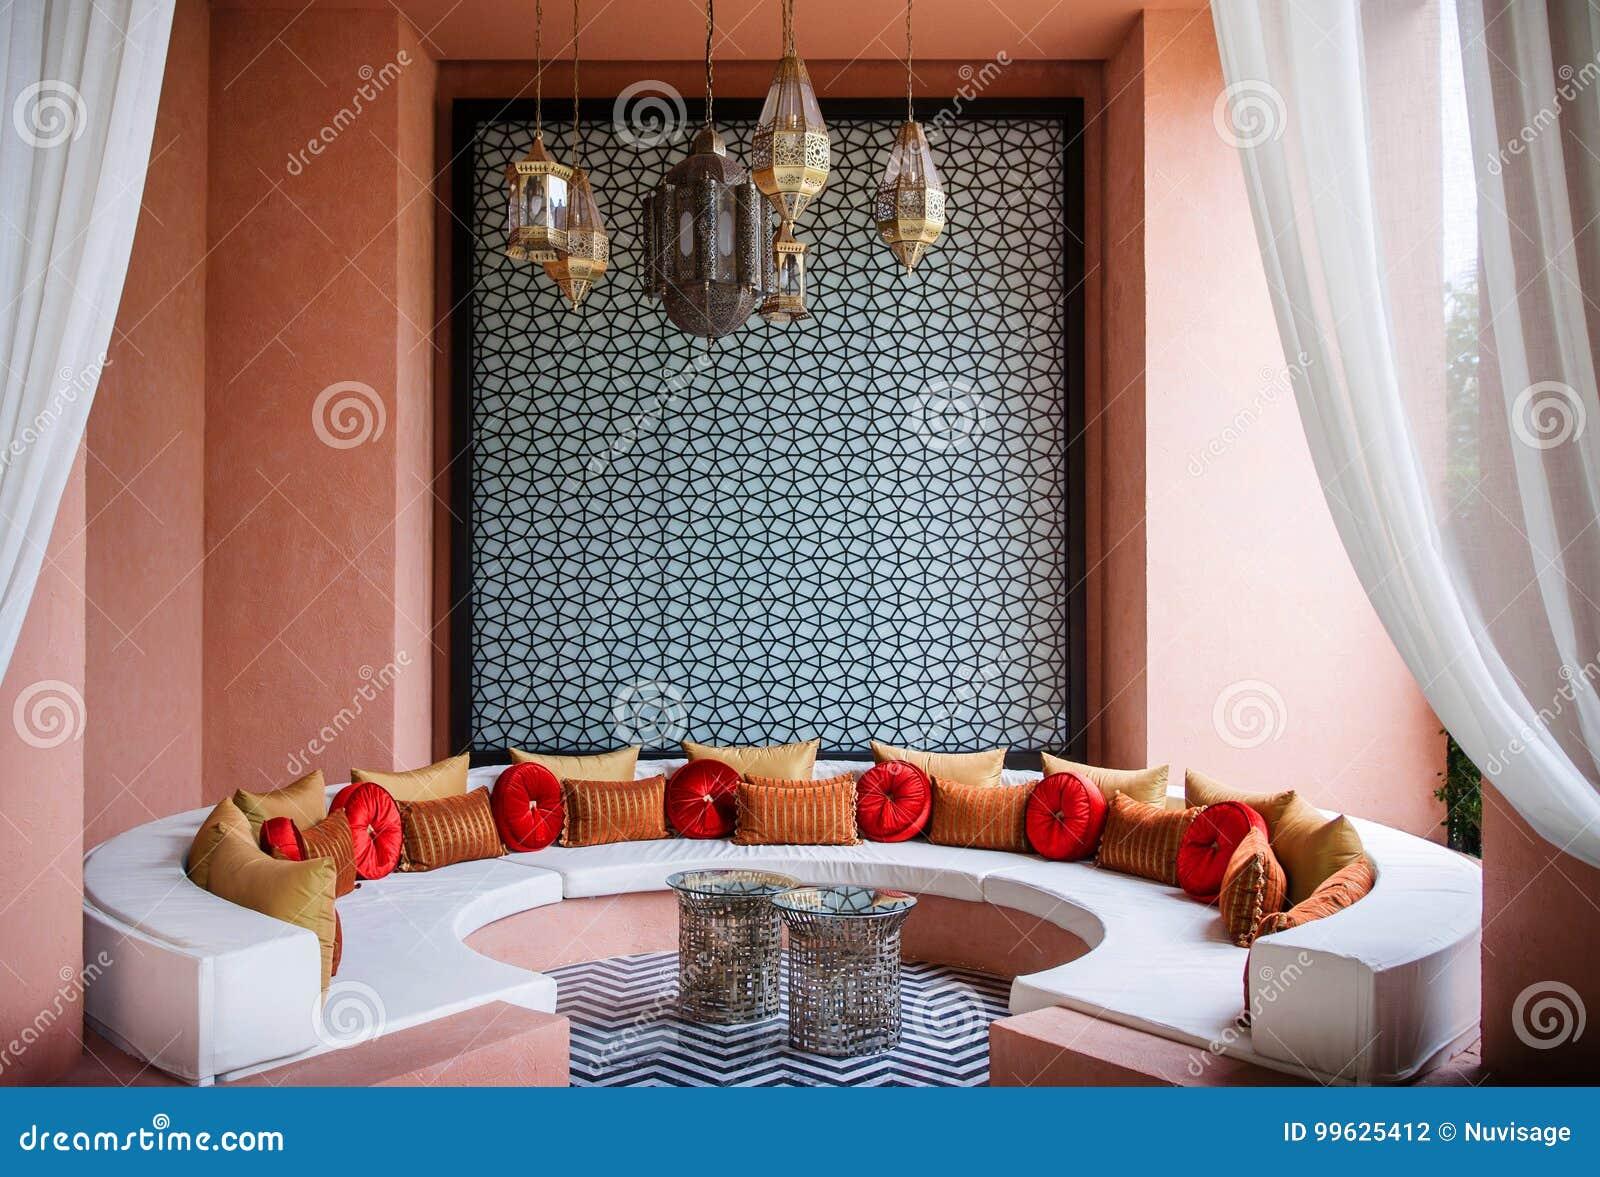 Marokkaanse stijlwoonkamer marokkaanse decoratie redactionele